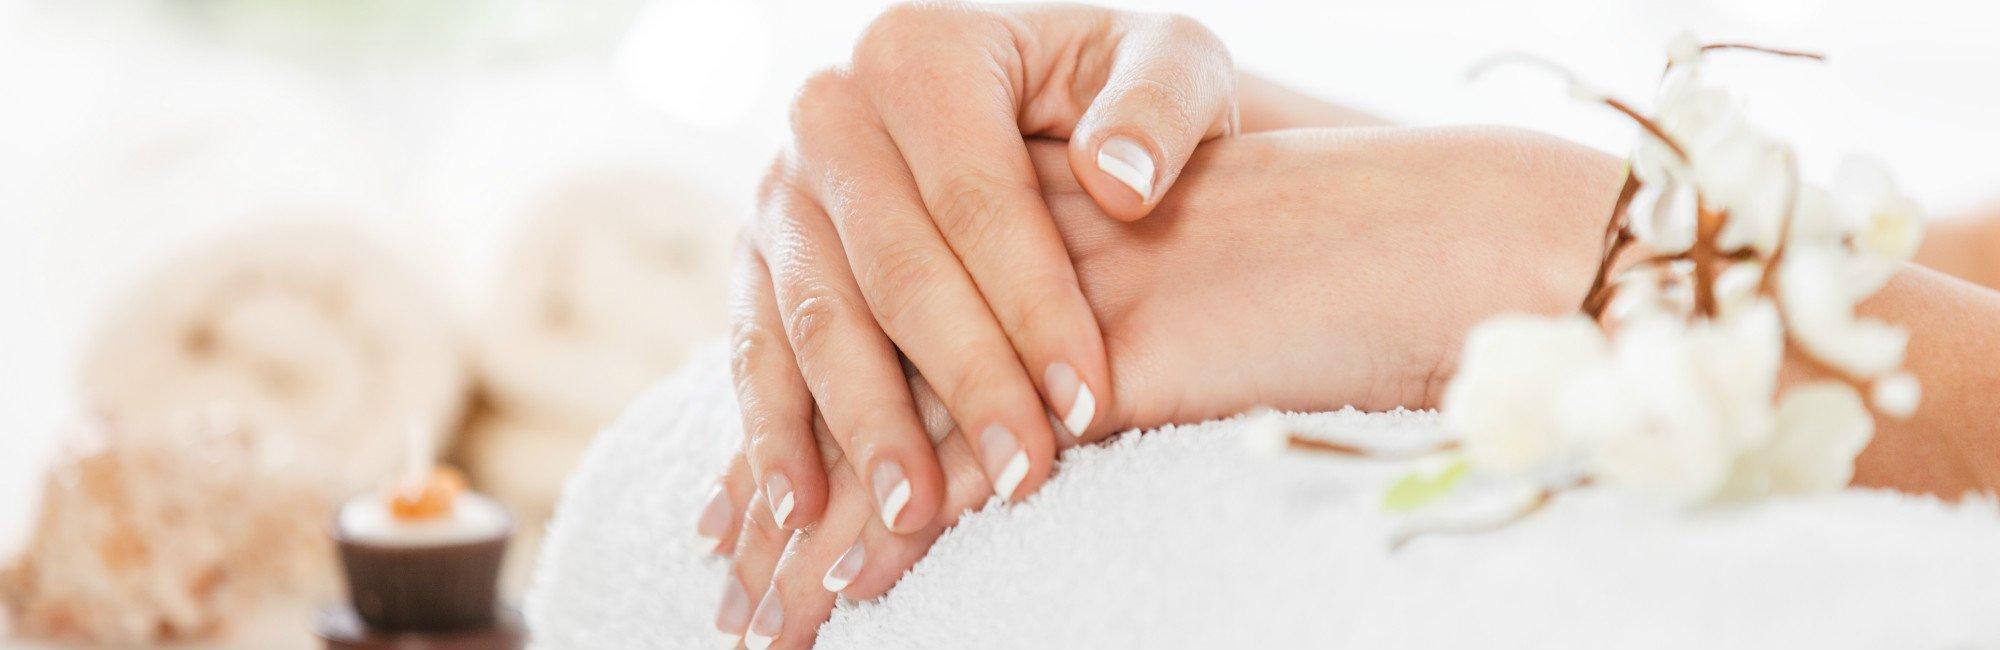 Crantock Bay Spa Manicure - Spa Days and Treatments